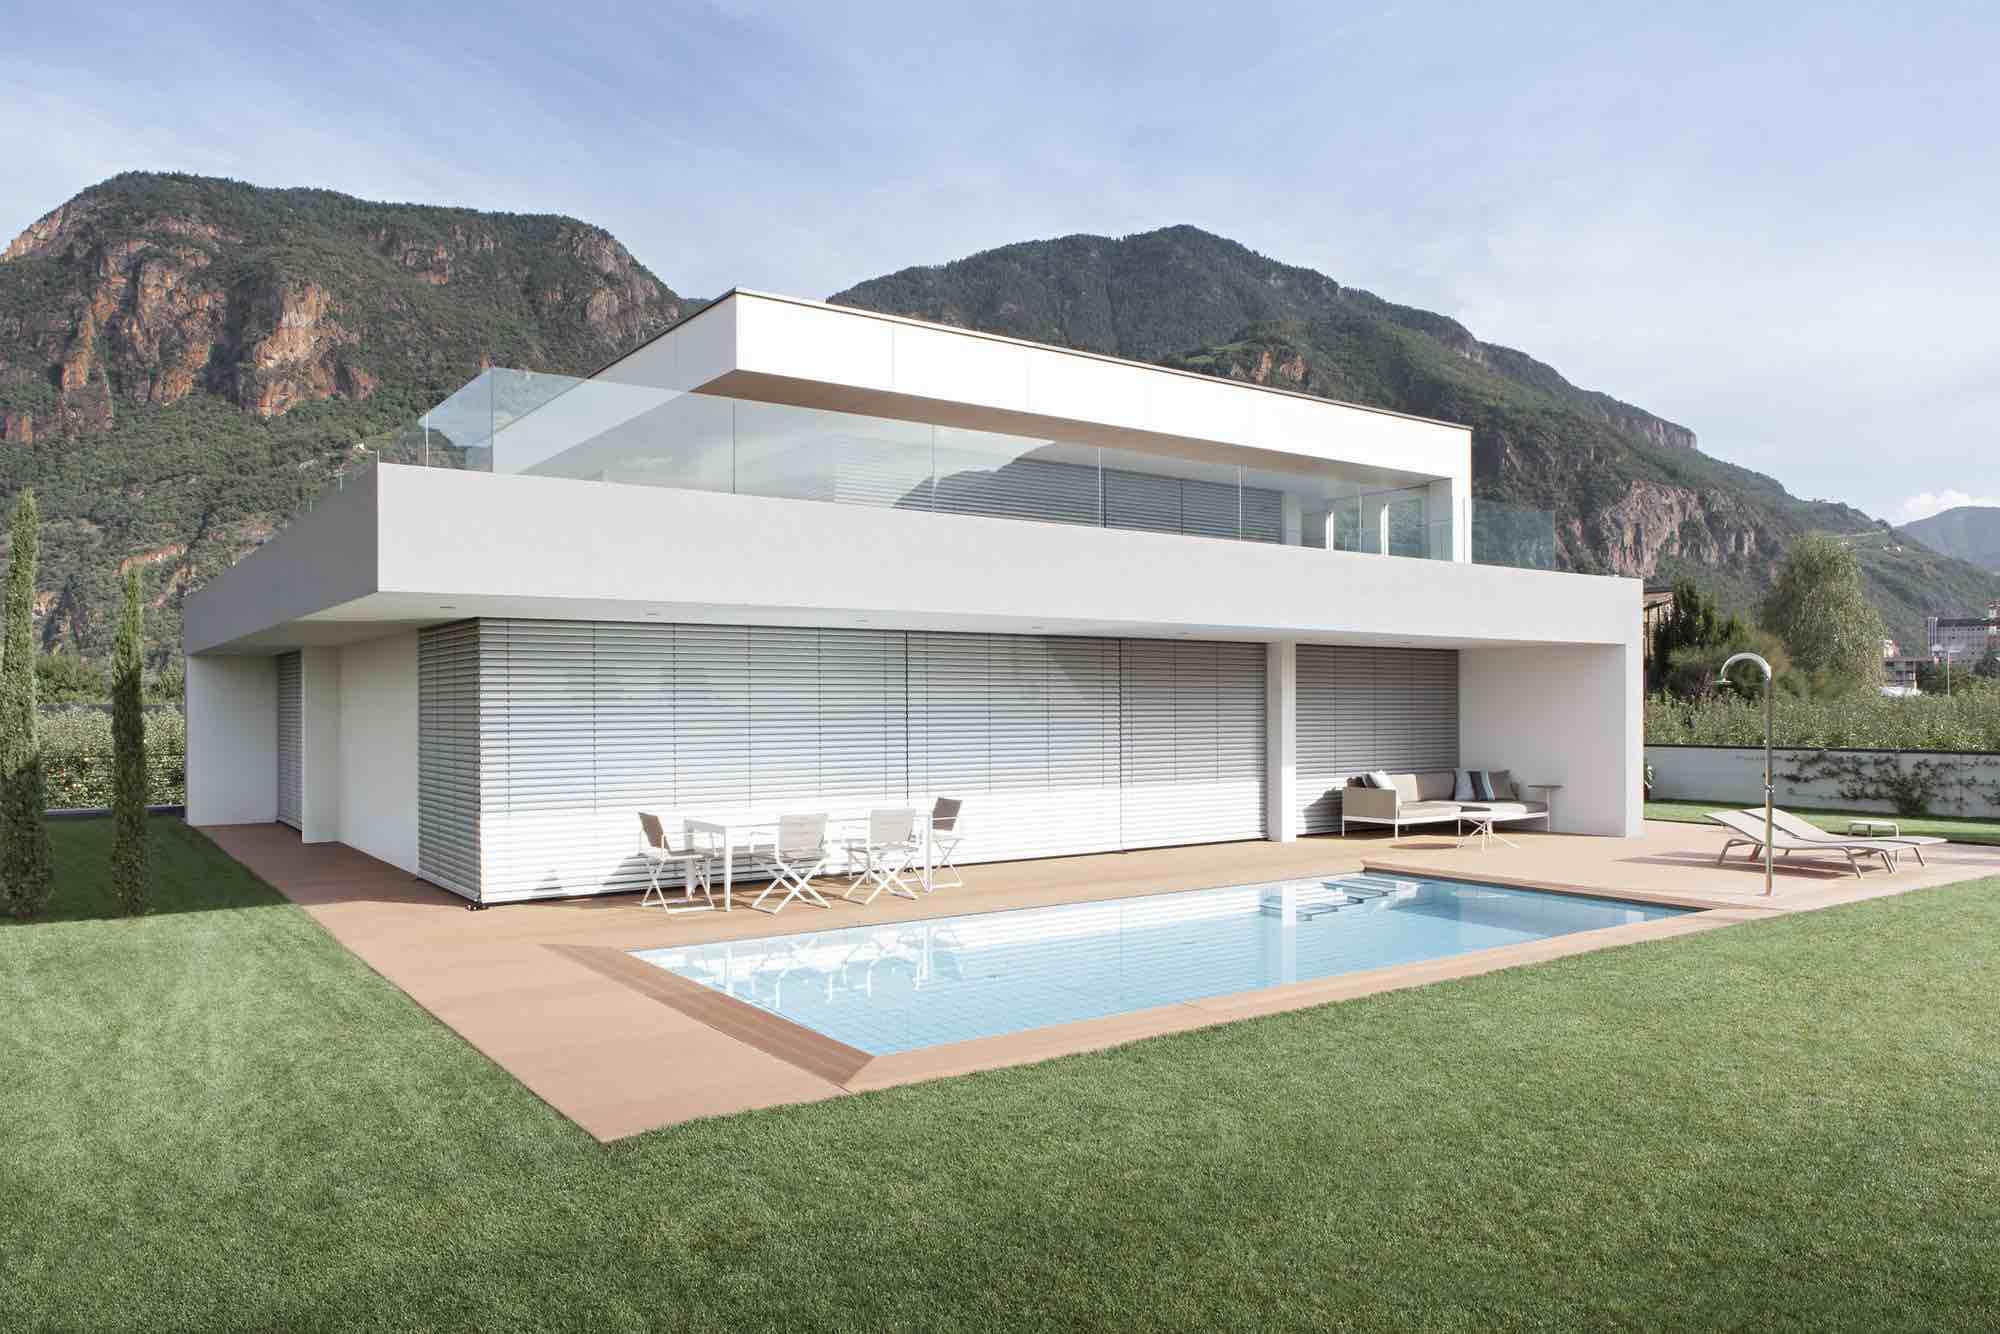 m2-house-monovolume-architecture-design_villa_moritzing_02